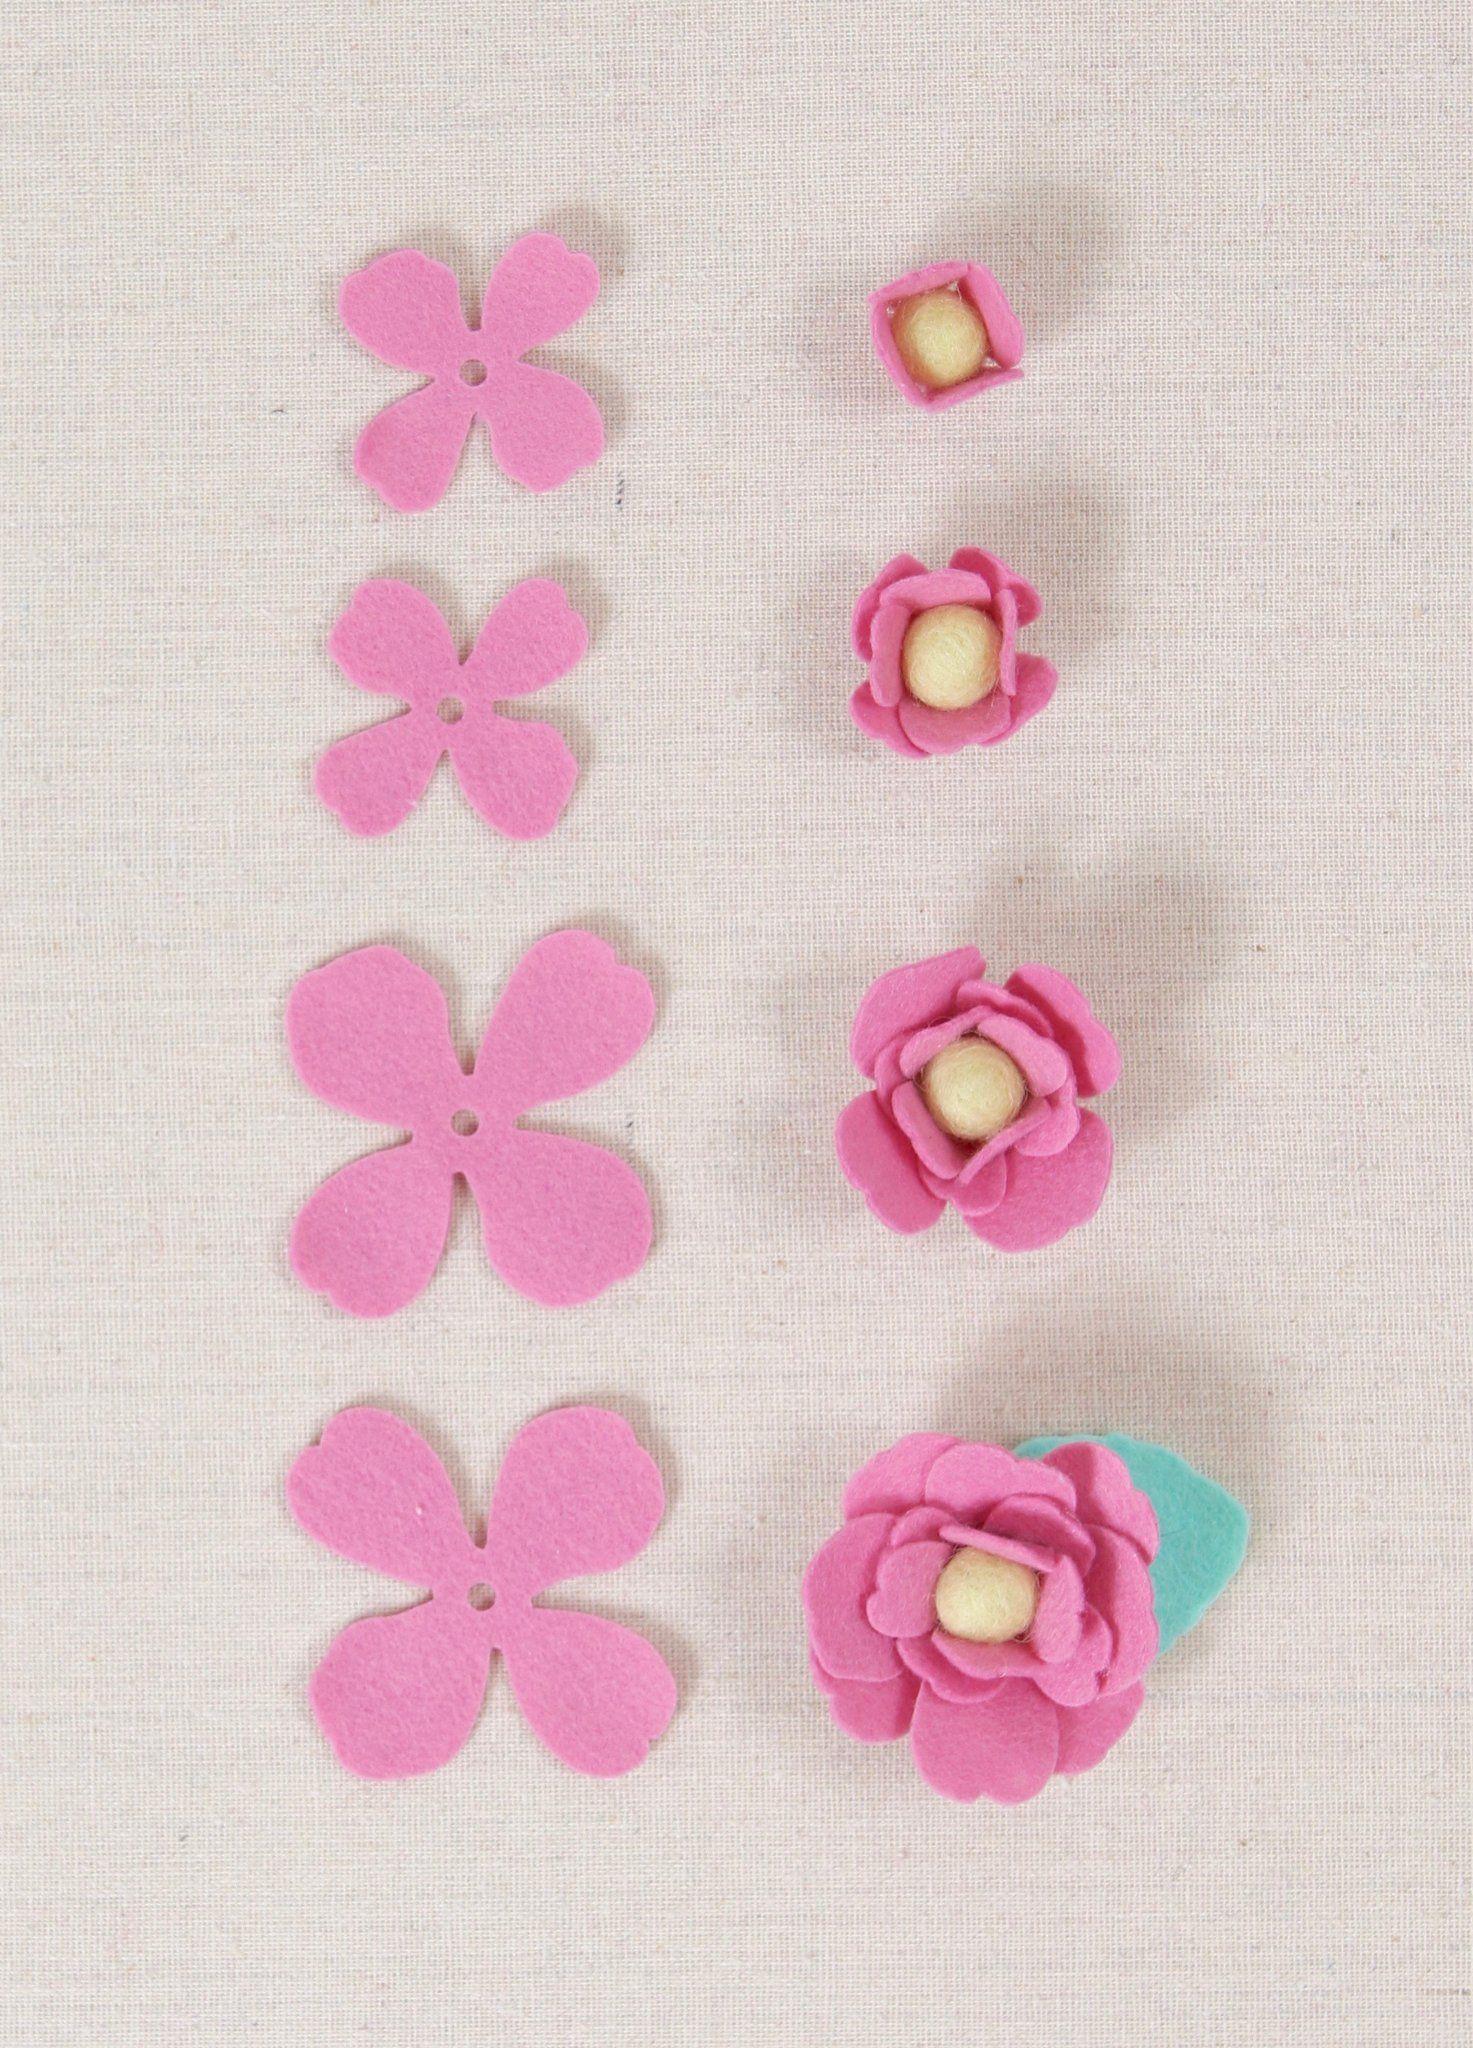 How To Make Felt Flowers Felt Flowers Diy